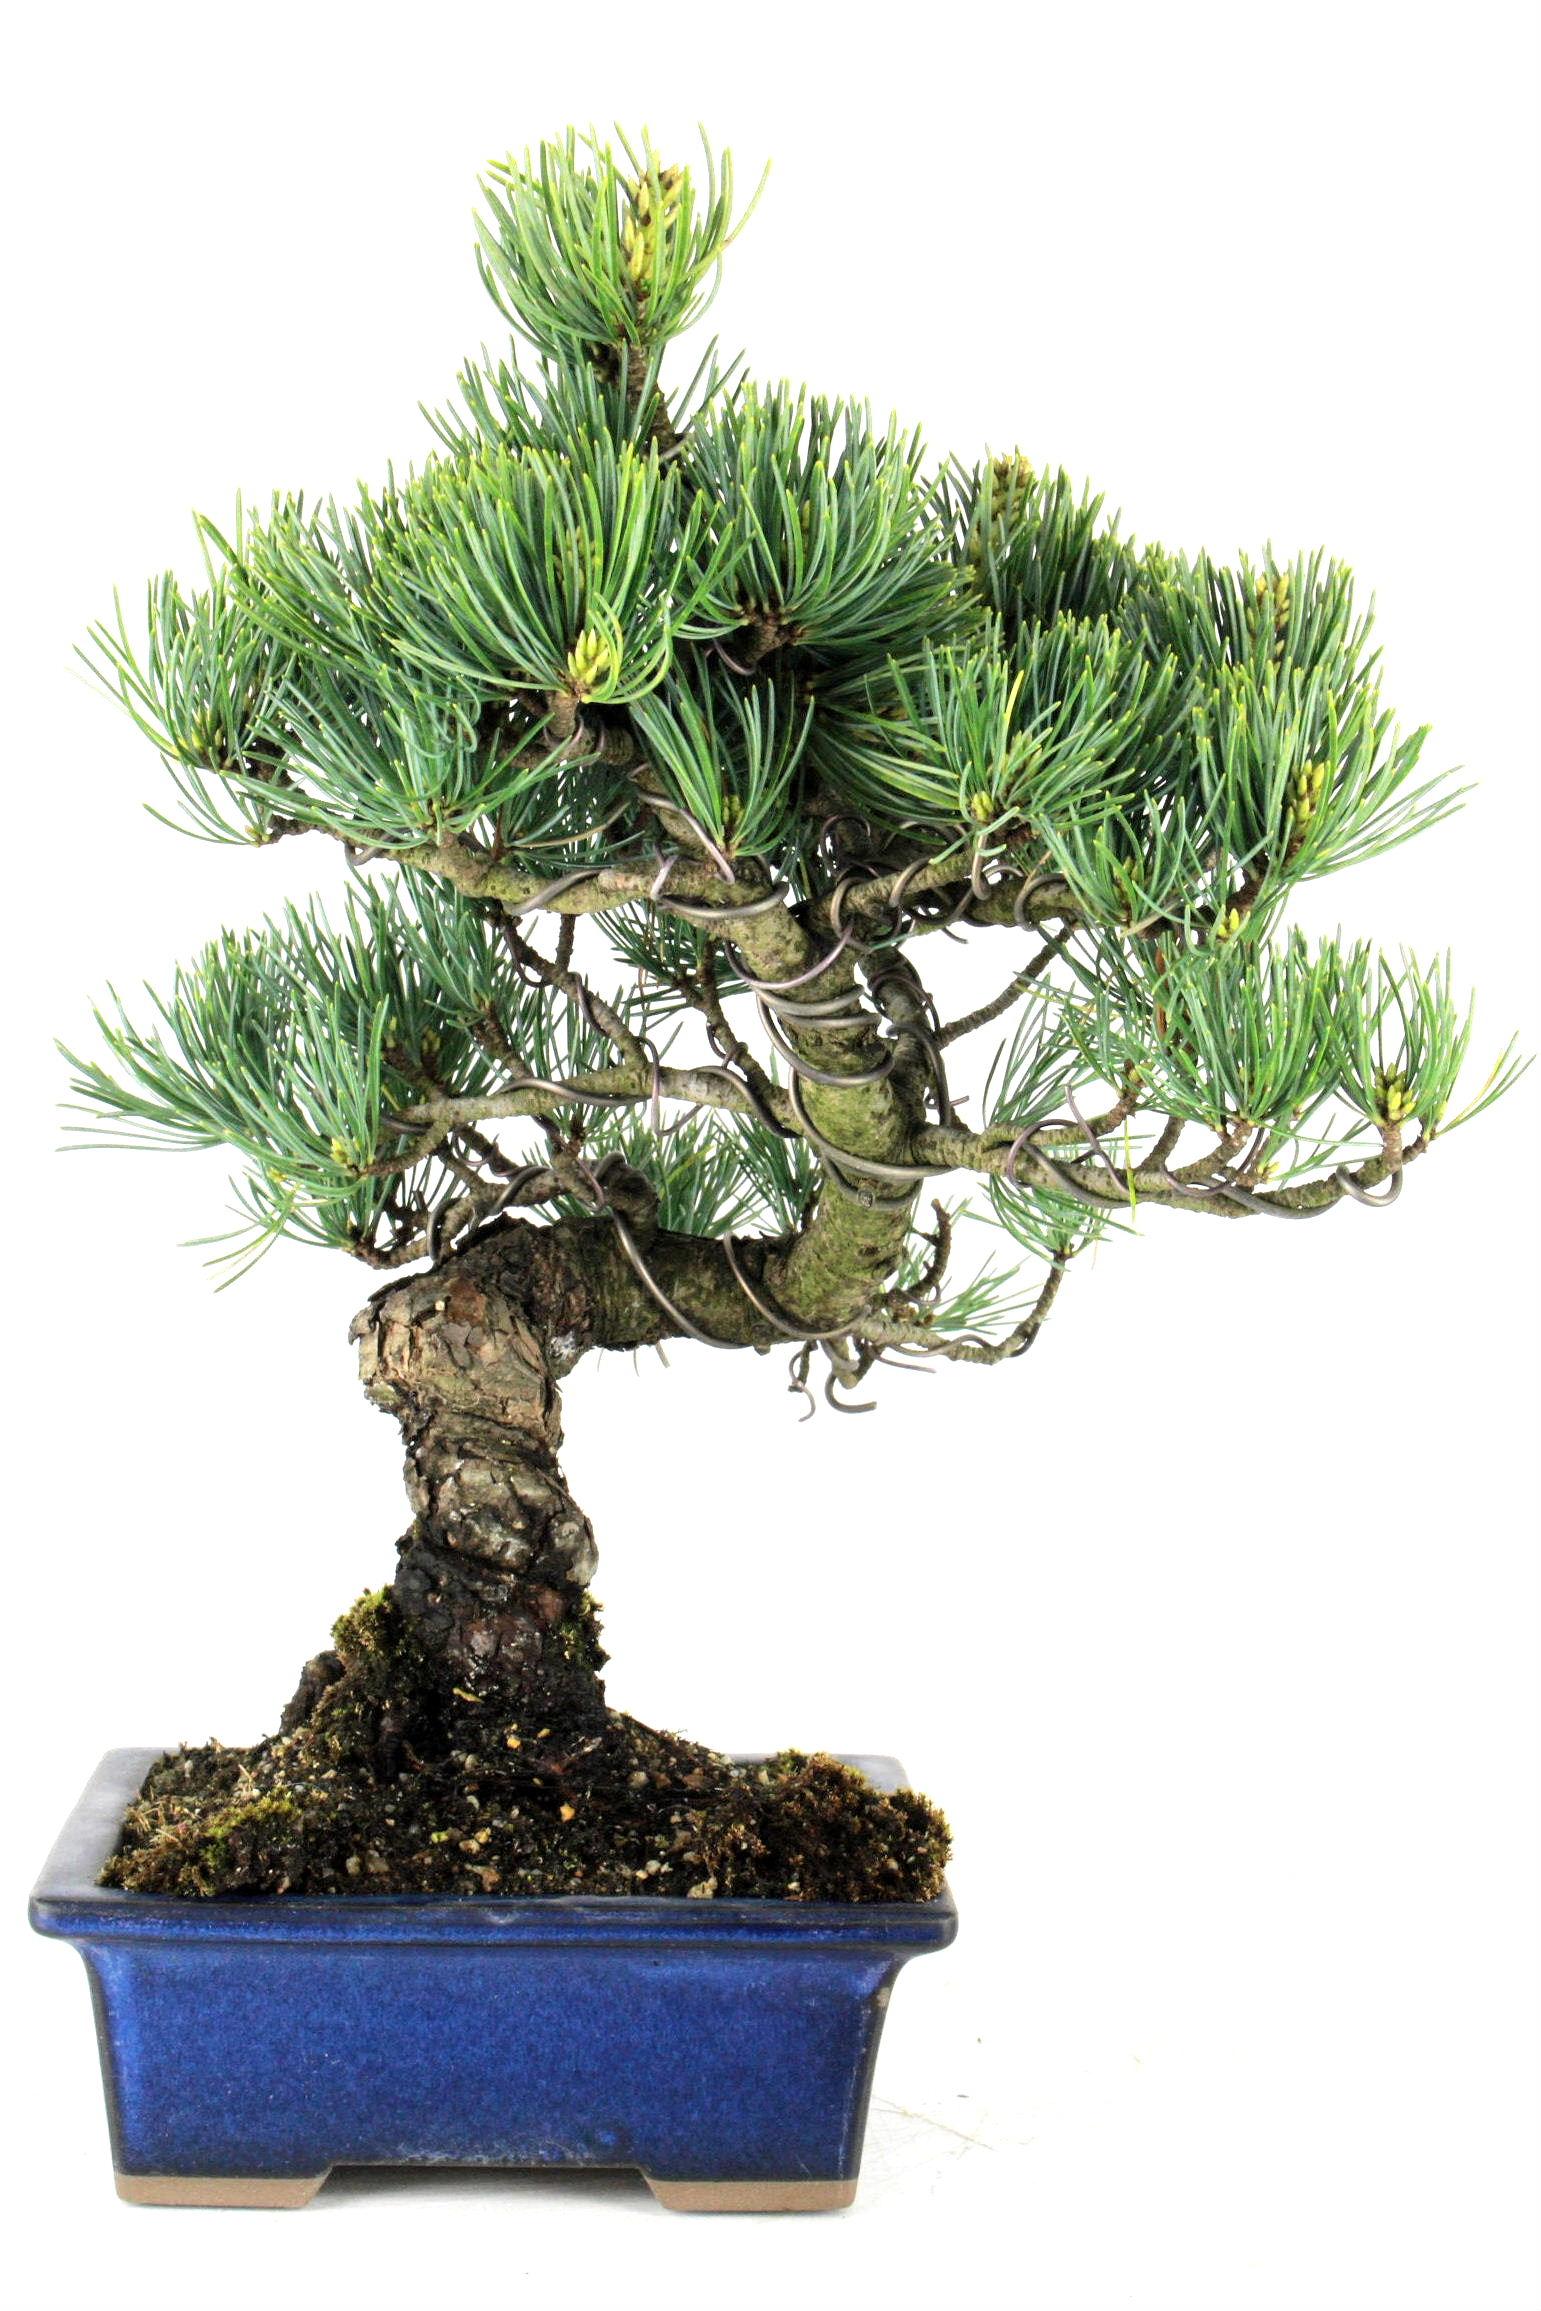 bonsai m dchenkiefer aus japan 34 cm 10 jahre b1623 bei oyaki bonsai kaufen. Black Bedroom Furniture Sets. Home Design Ideas